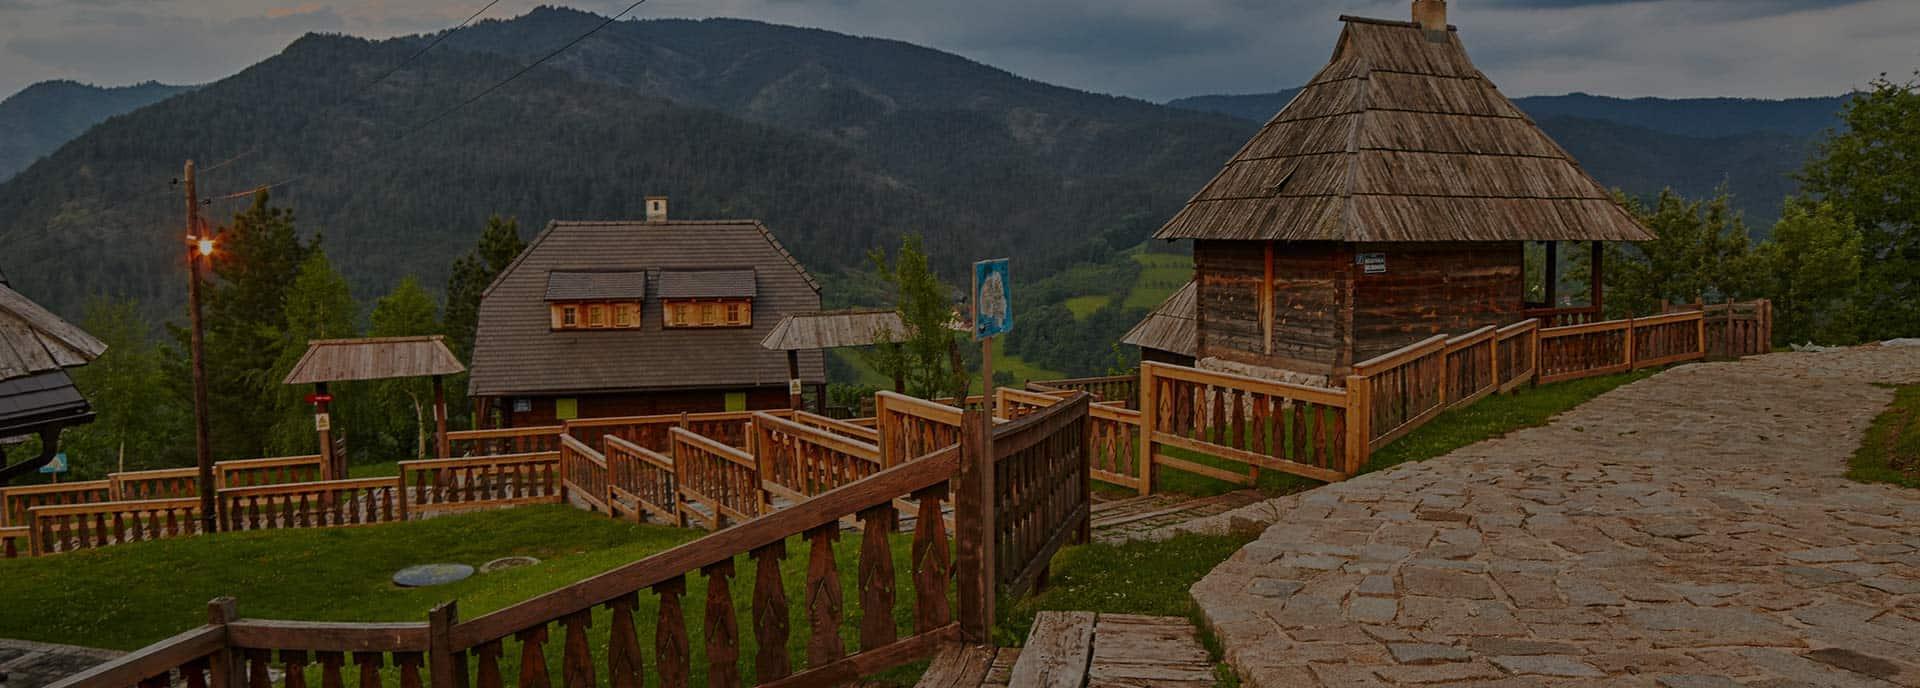 Mokra Gora - planinsko selo